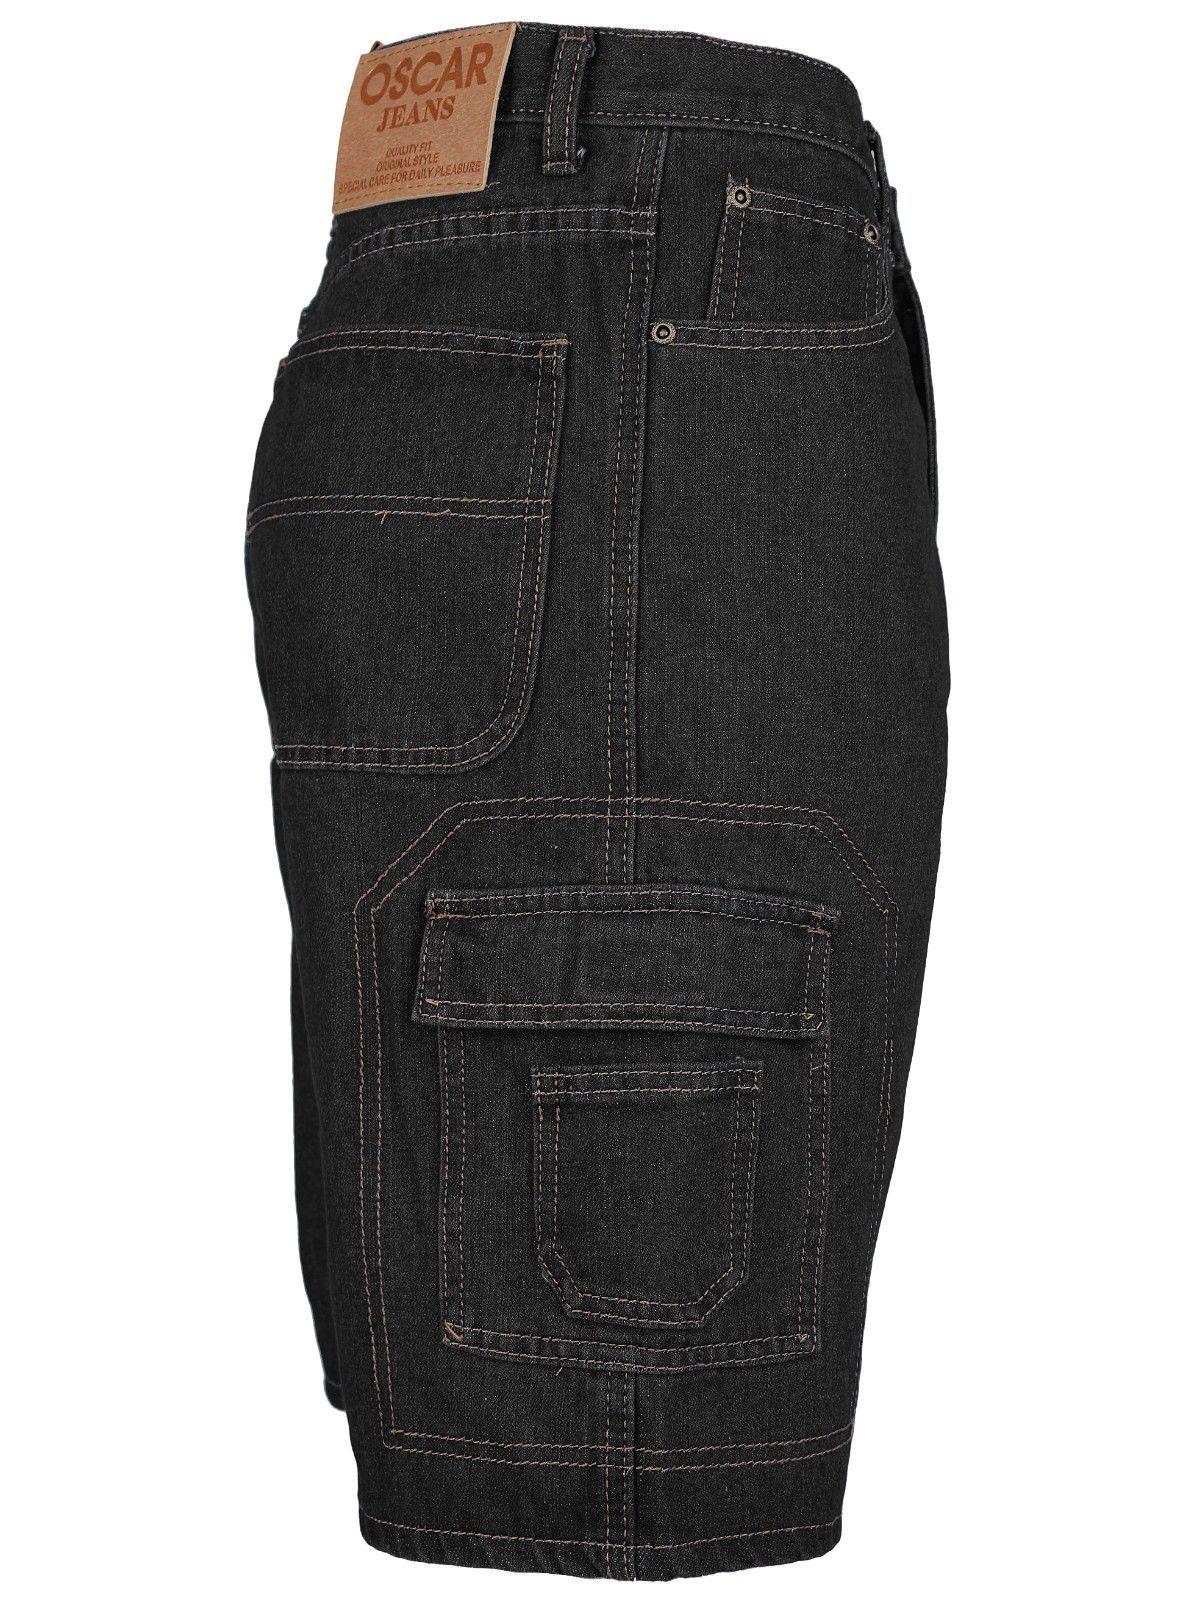 Men-039-s-Premium-Cotton-Multi-Pocket-Relaxed-Fit-Stonewash-Denim-Jean-Cargo-Shorts thumbnail 9